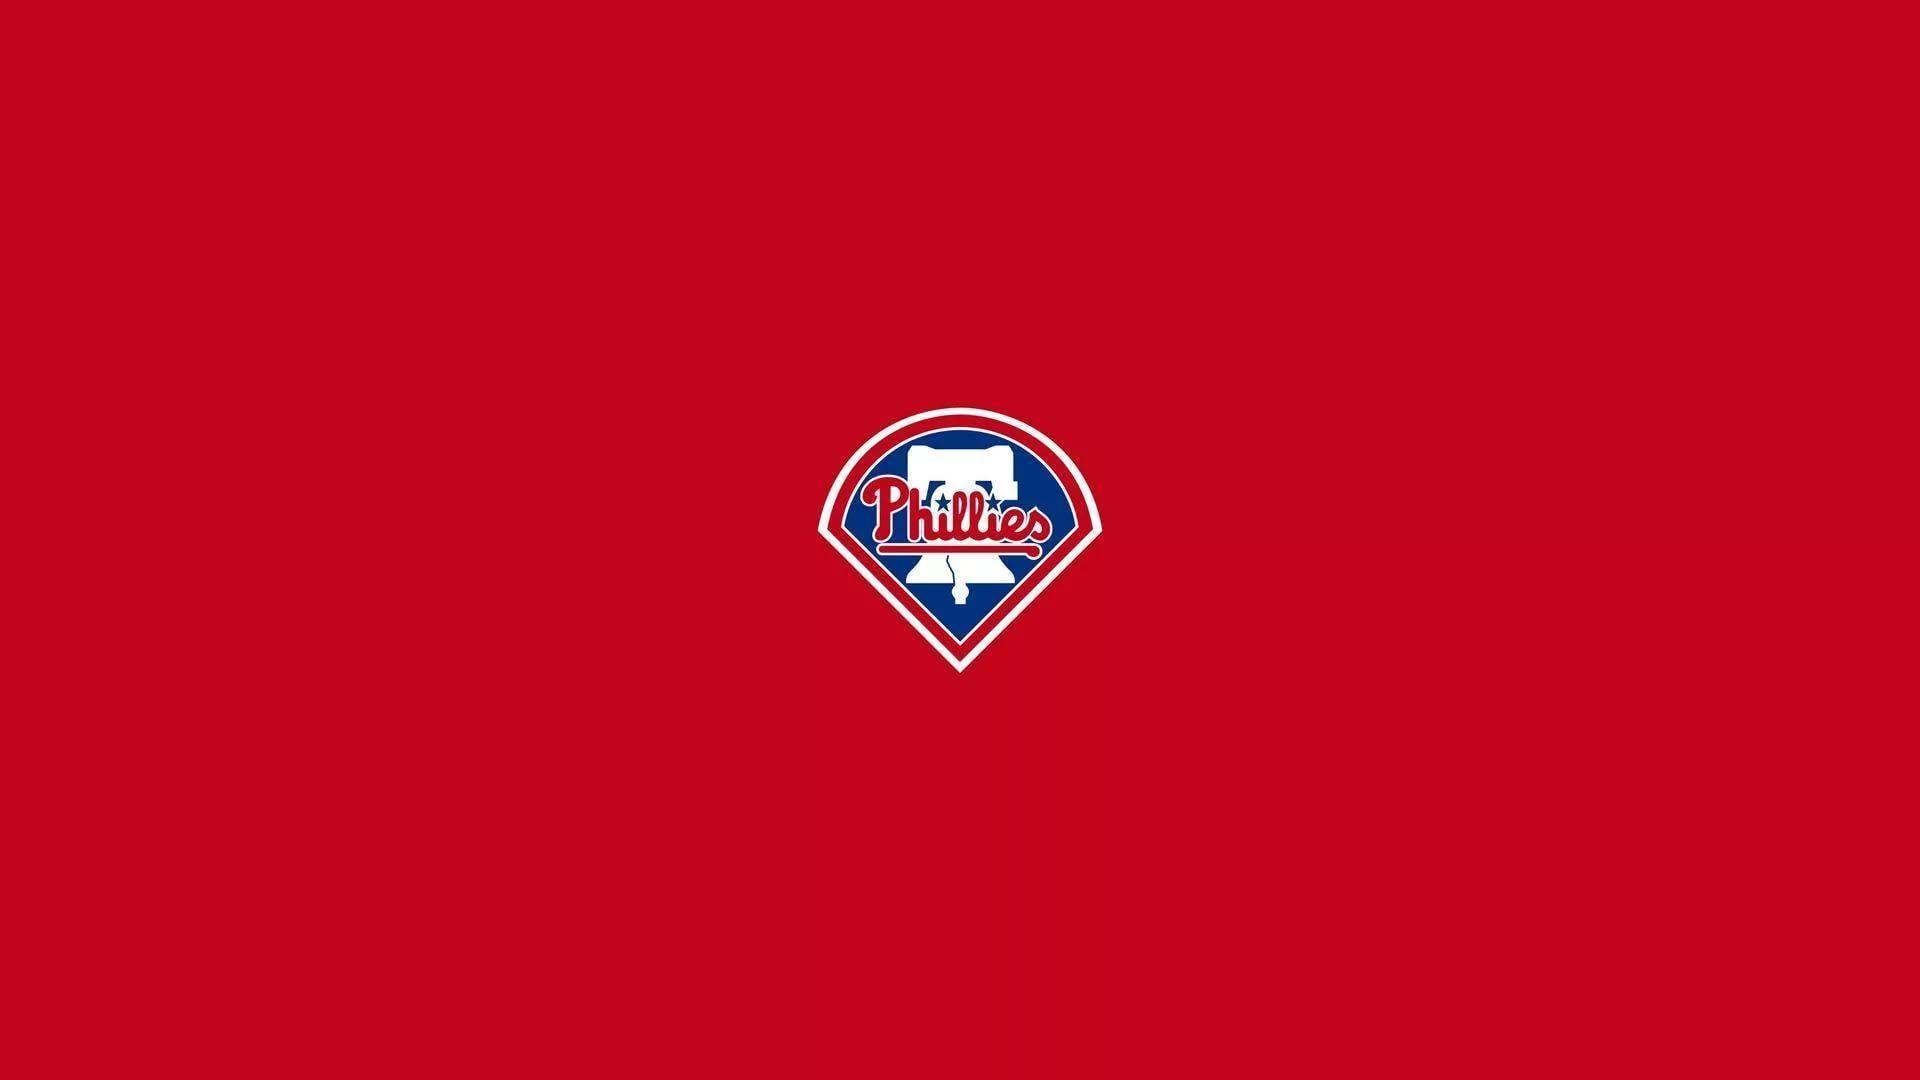 Phillies Logo High Definition